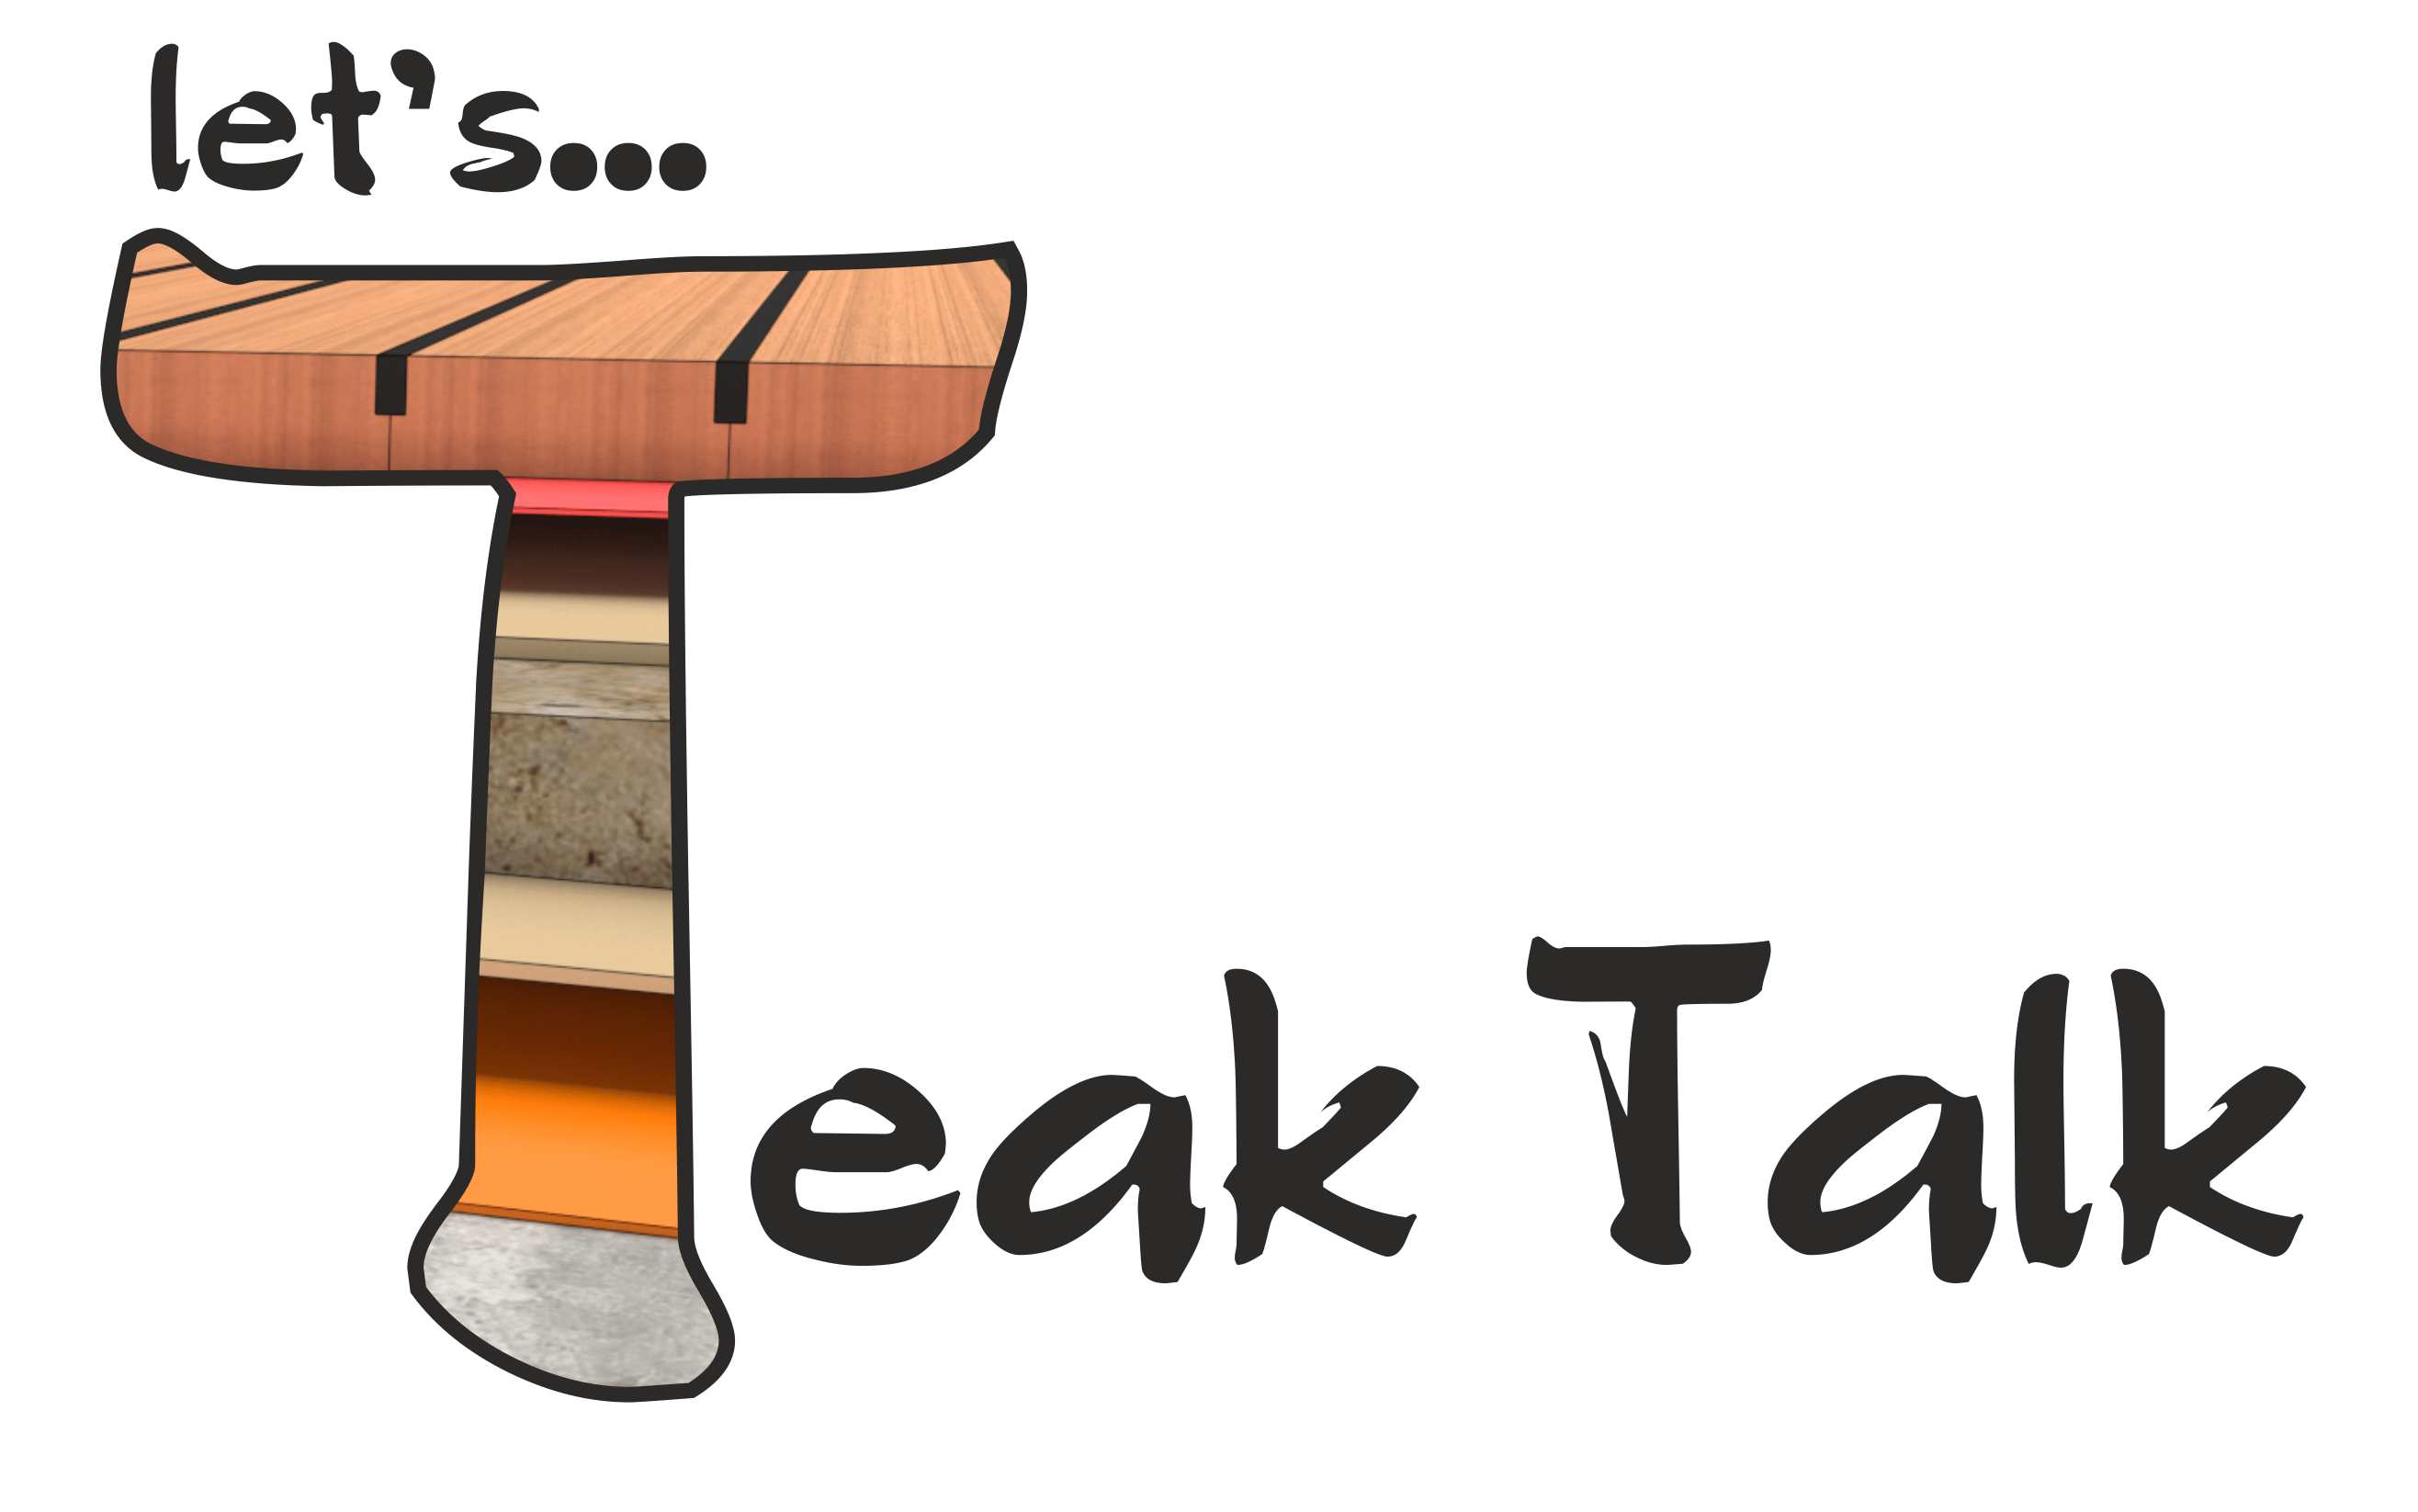 TEAK TALK